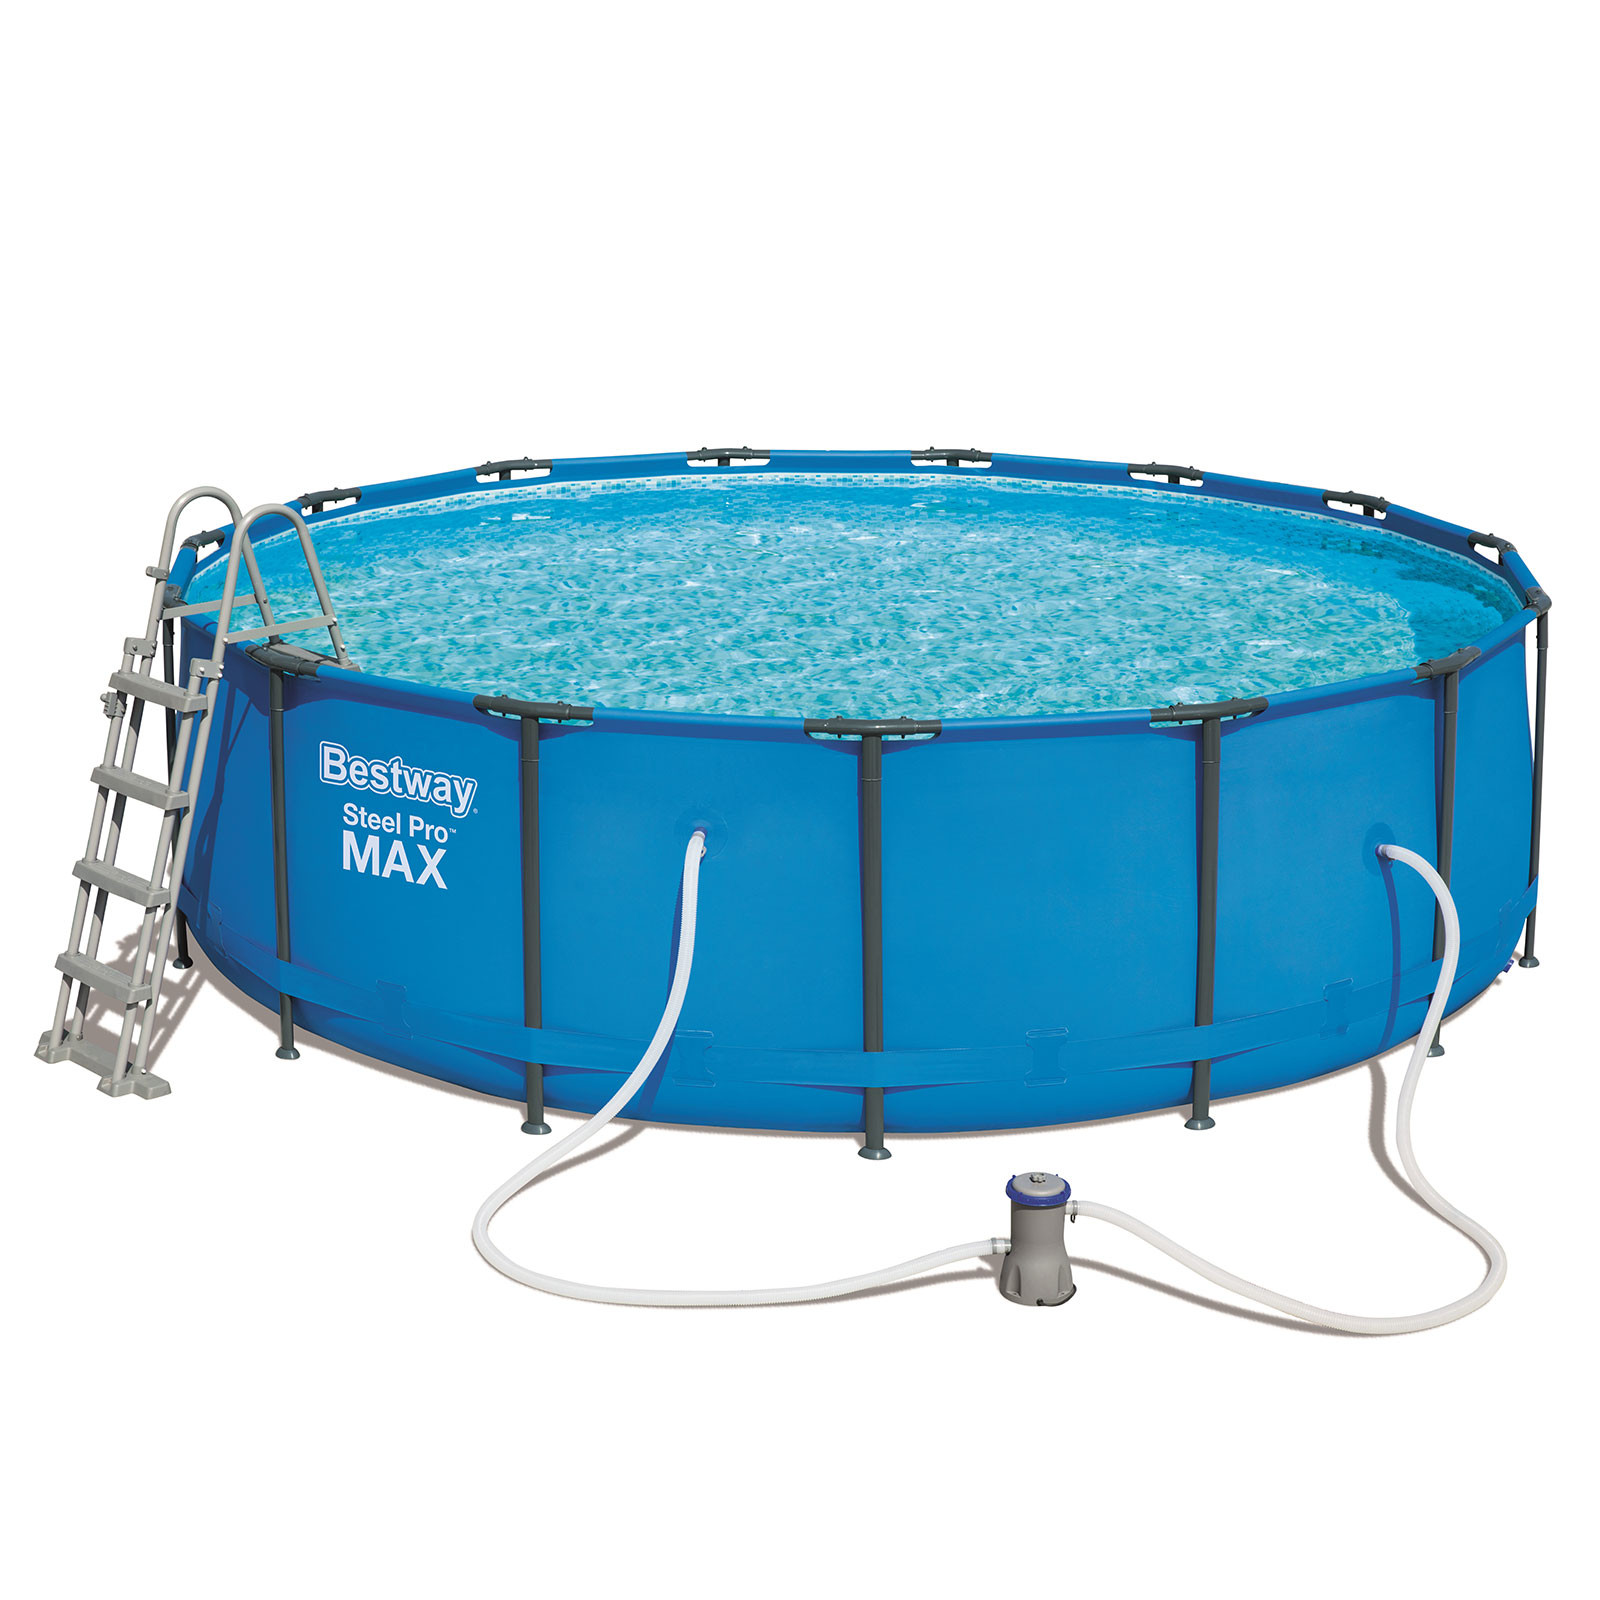 Bestway Removable Pool Tubular Steel Pro Max 457 Cm X 122 Cm Plant Cartridge 3.028 Liters/Hour -56438-